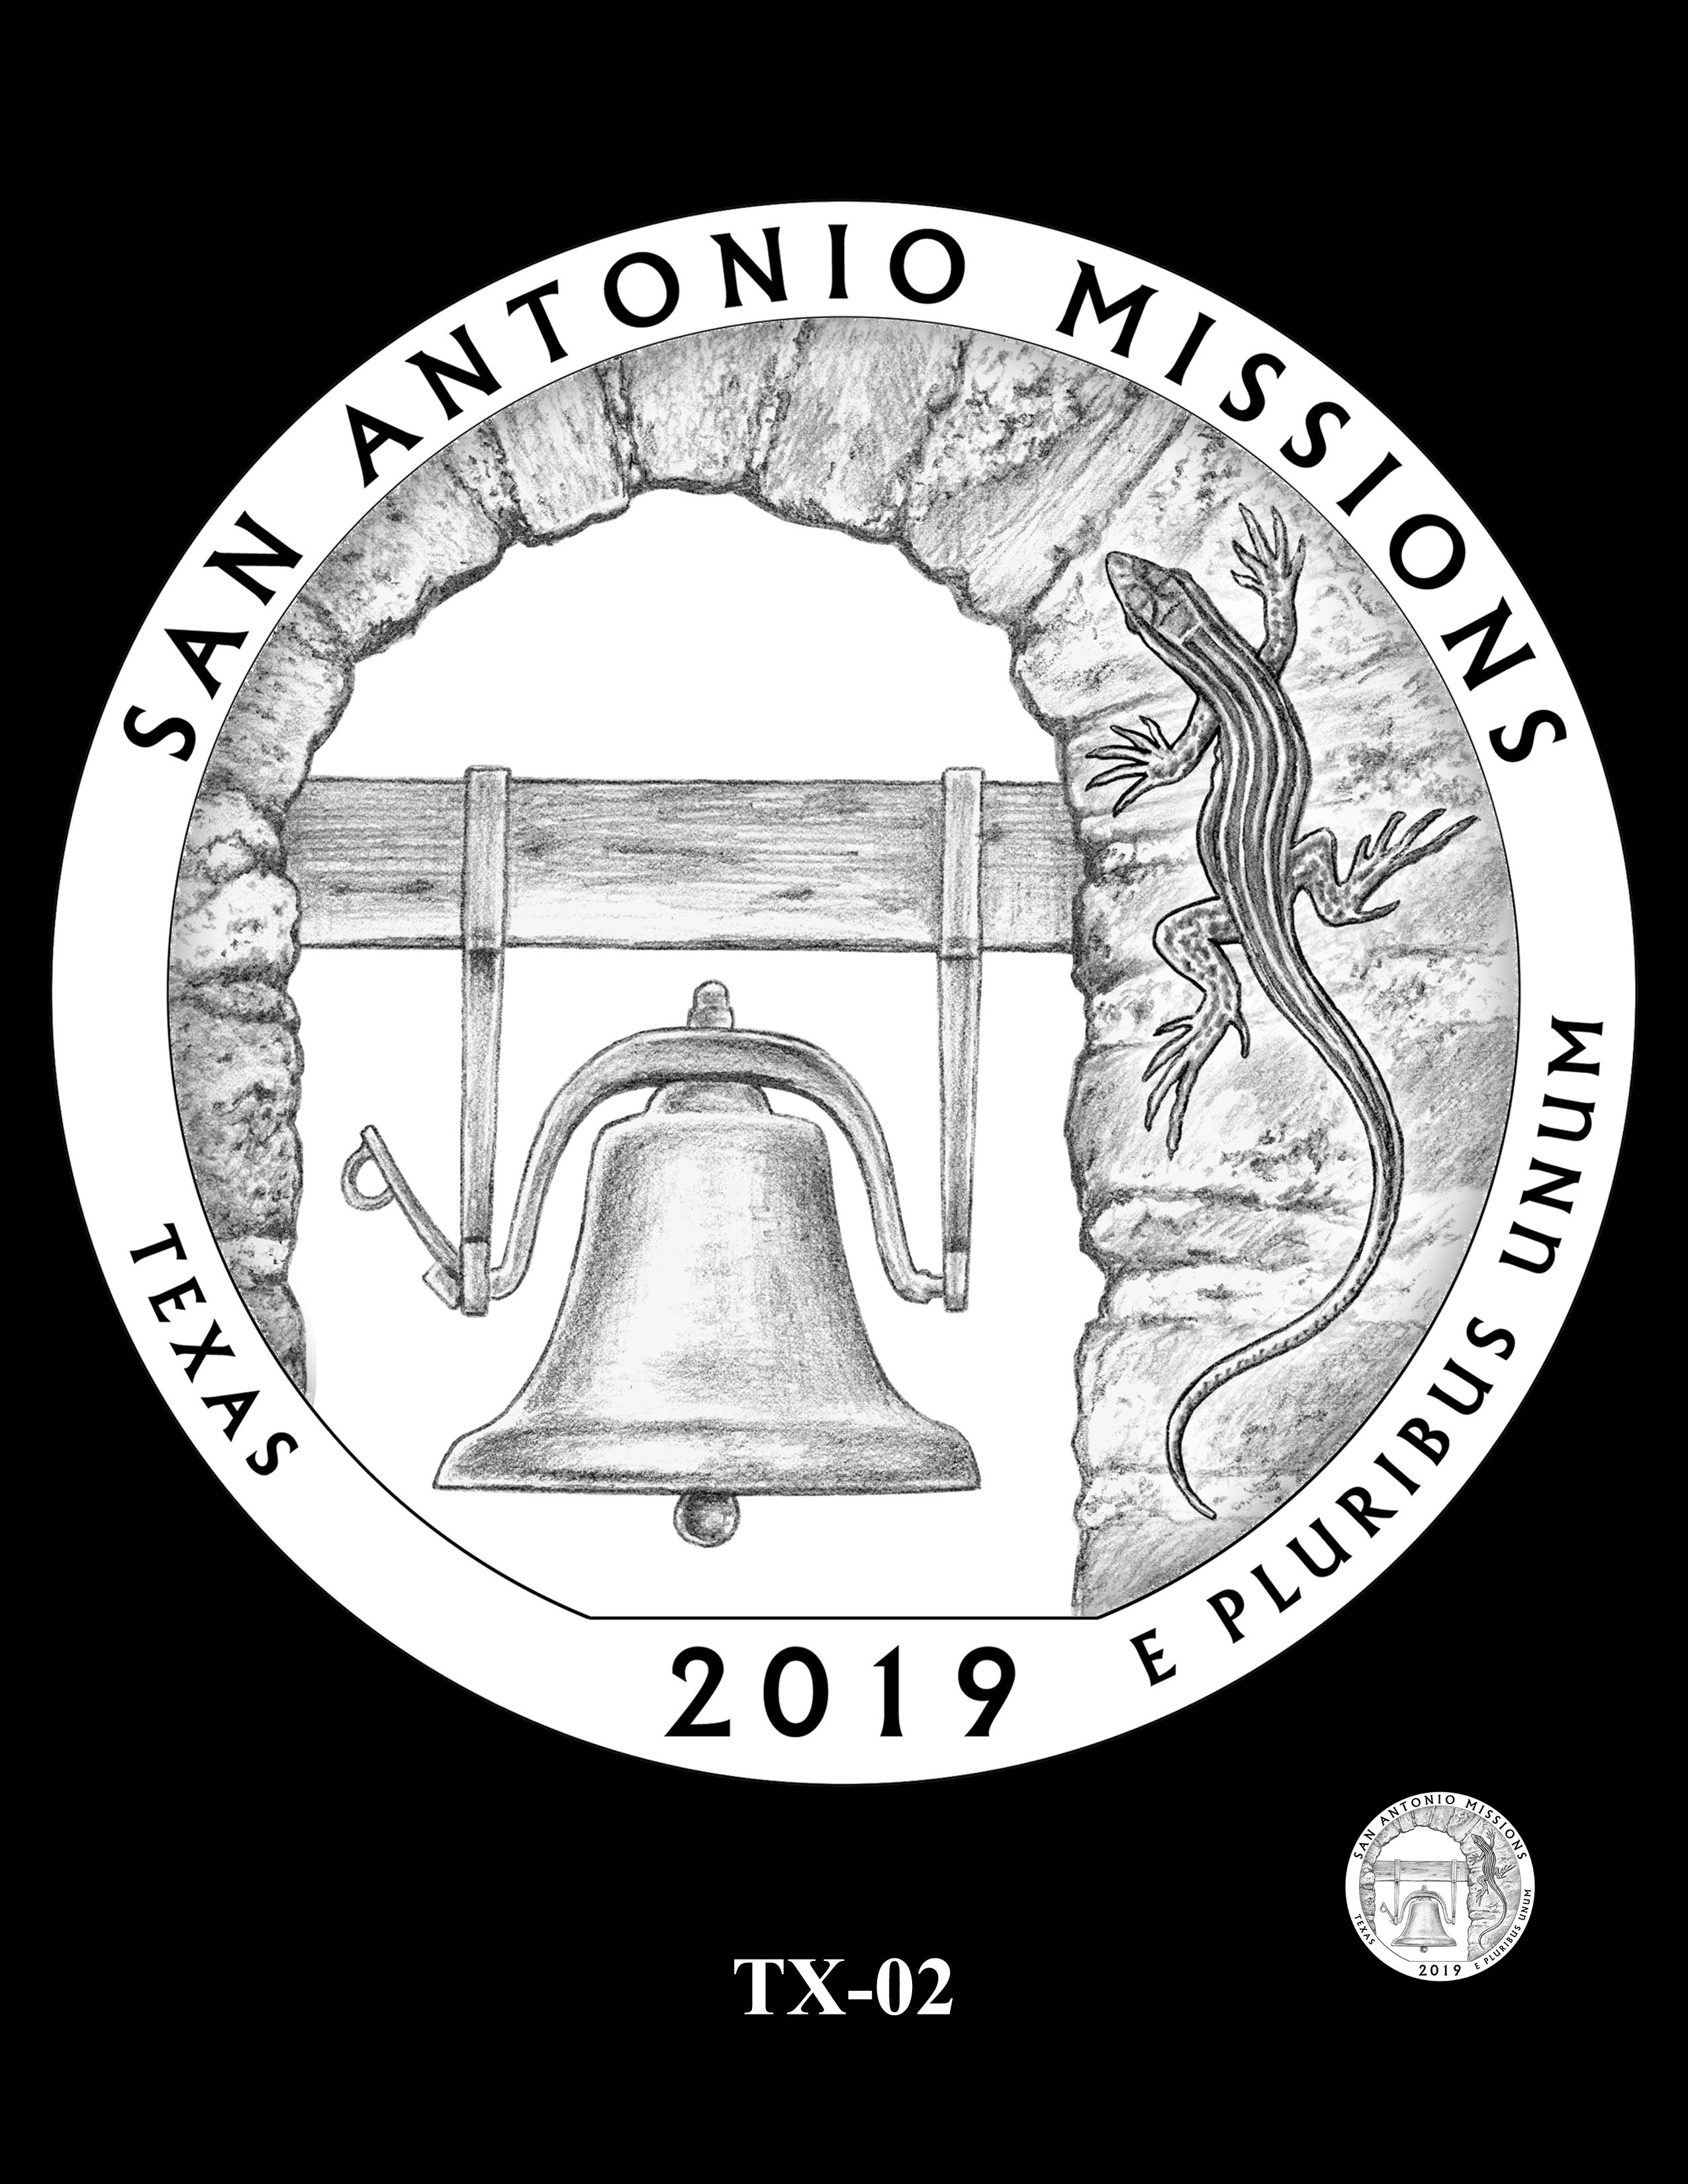 TX-02 -- 2019 America the Beautiful Quarters® Program